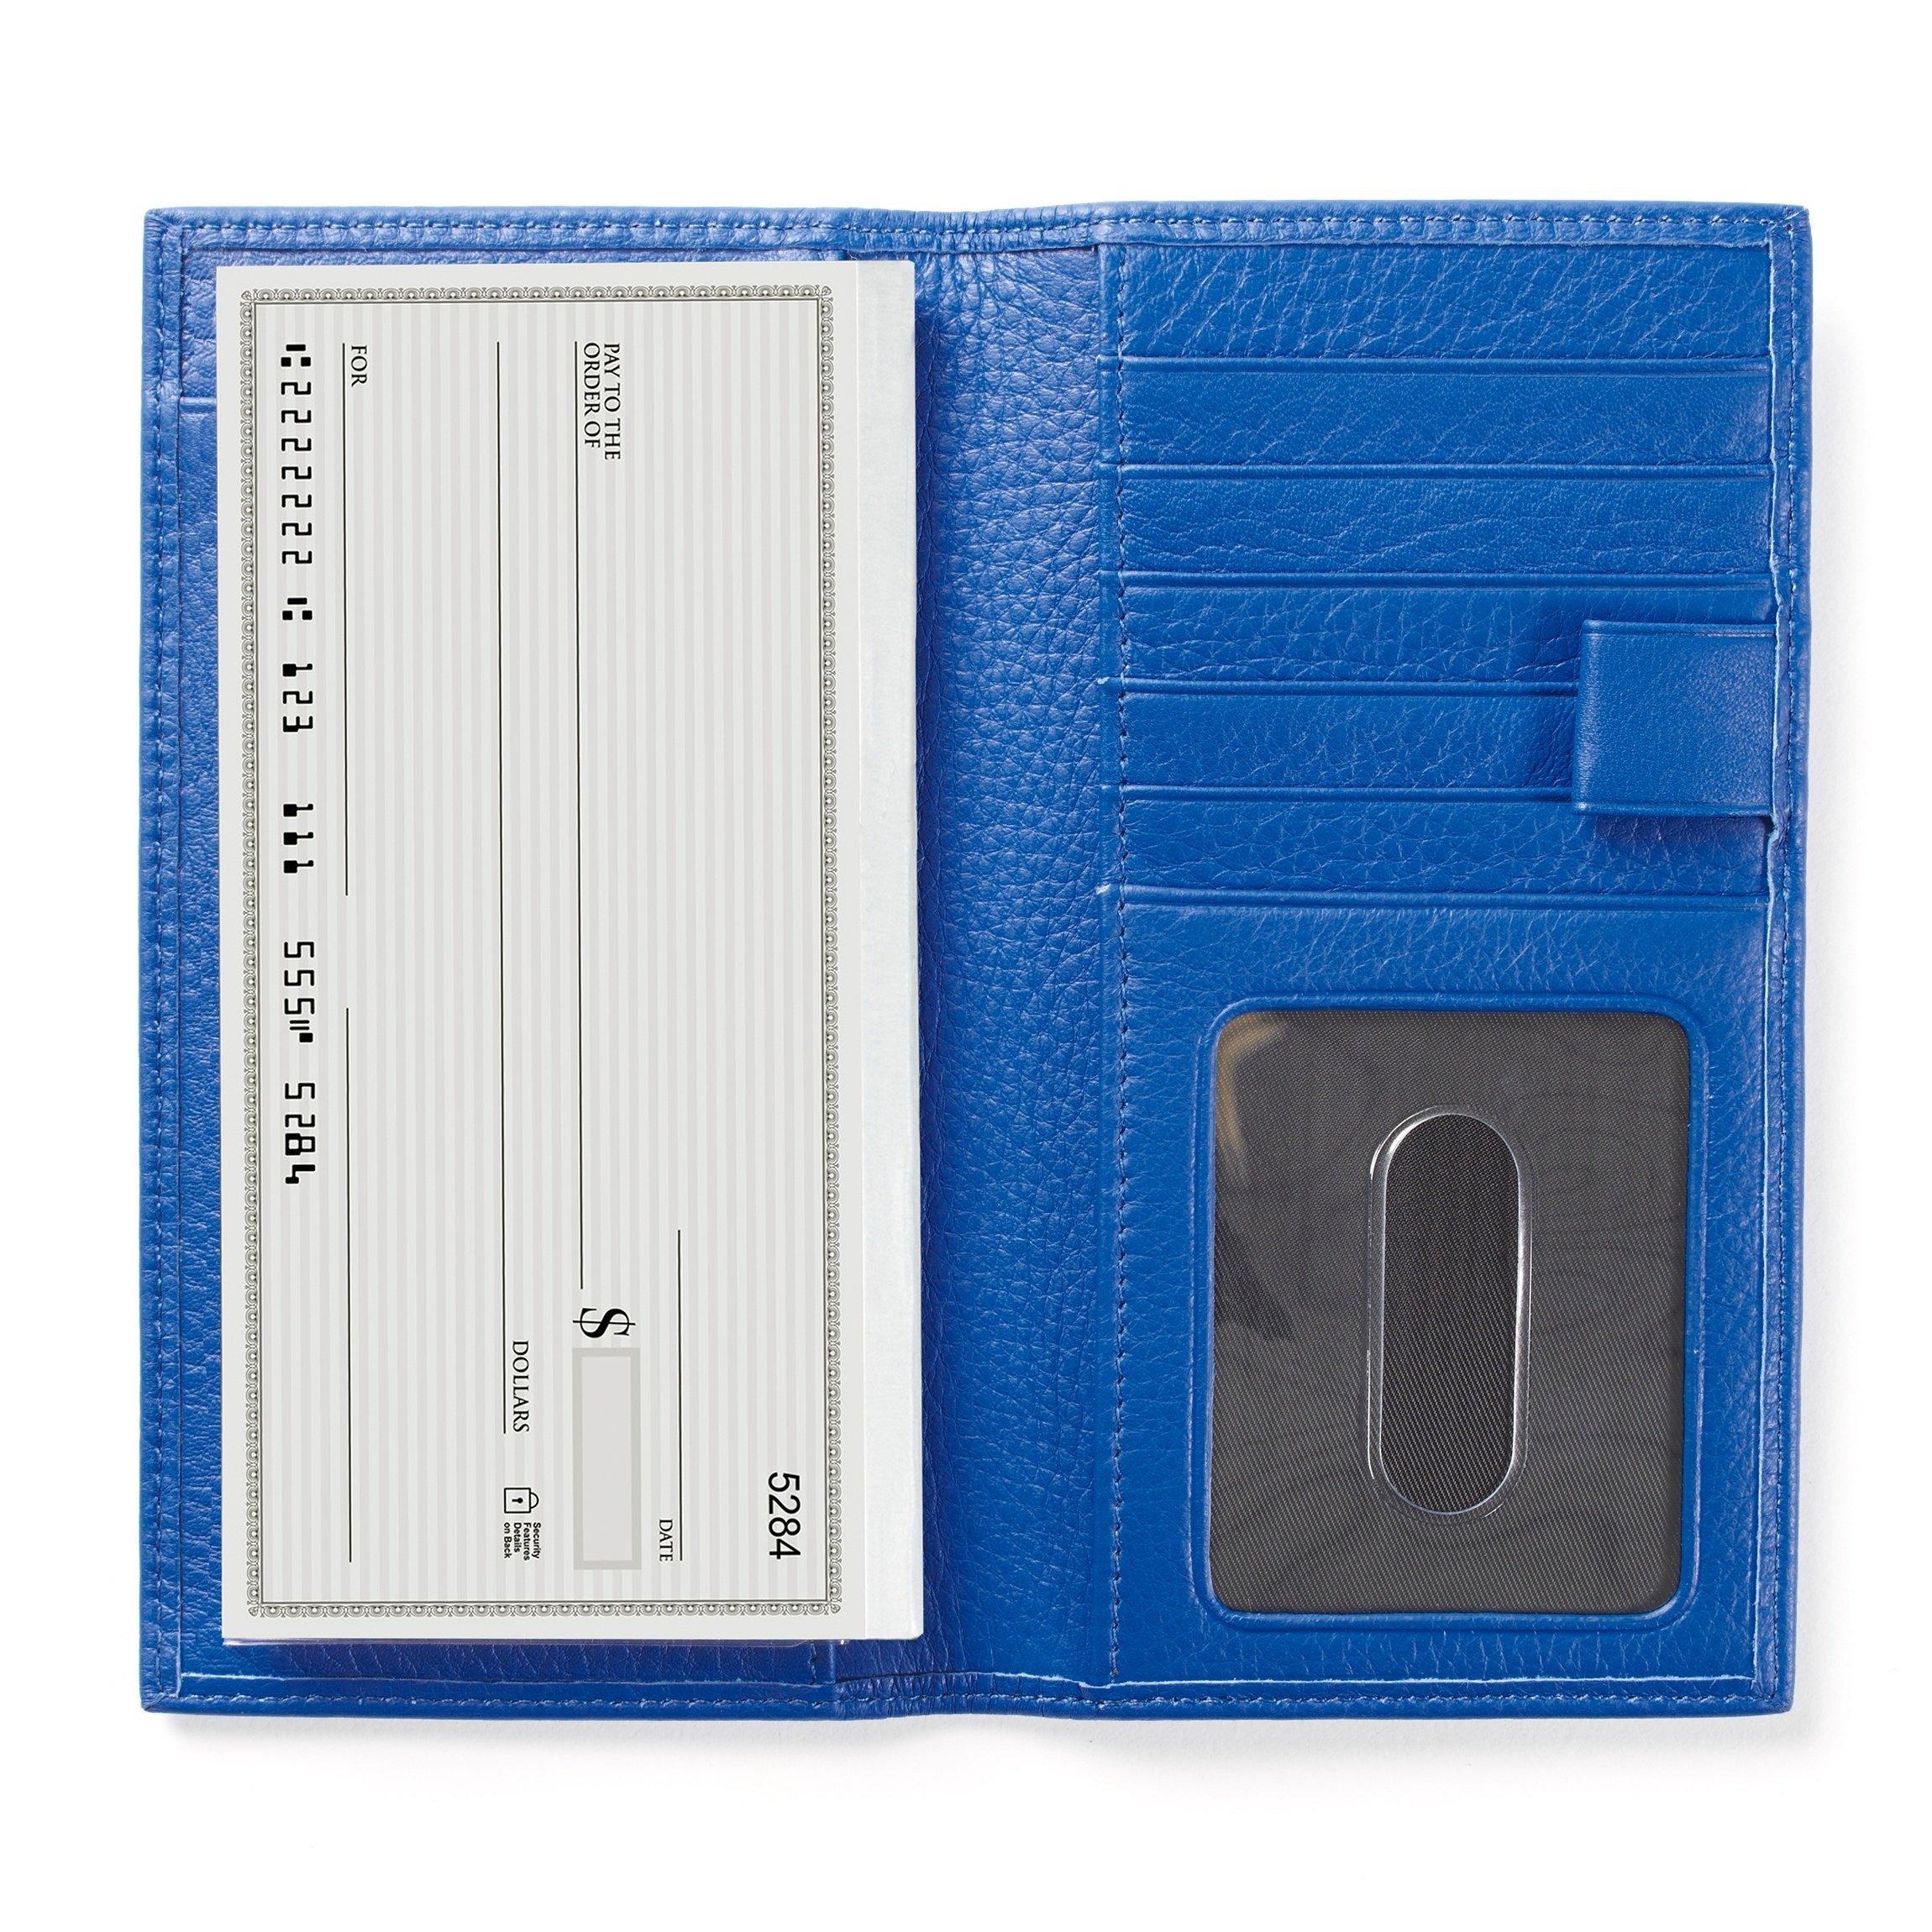 Leatherology Checkbook & Card Holder with Divider and Pen Loop - Full Grain Leather - Cobalt (blue)